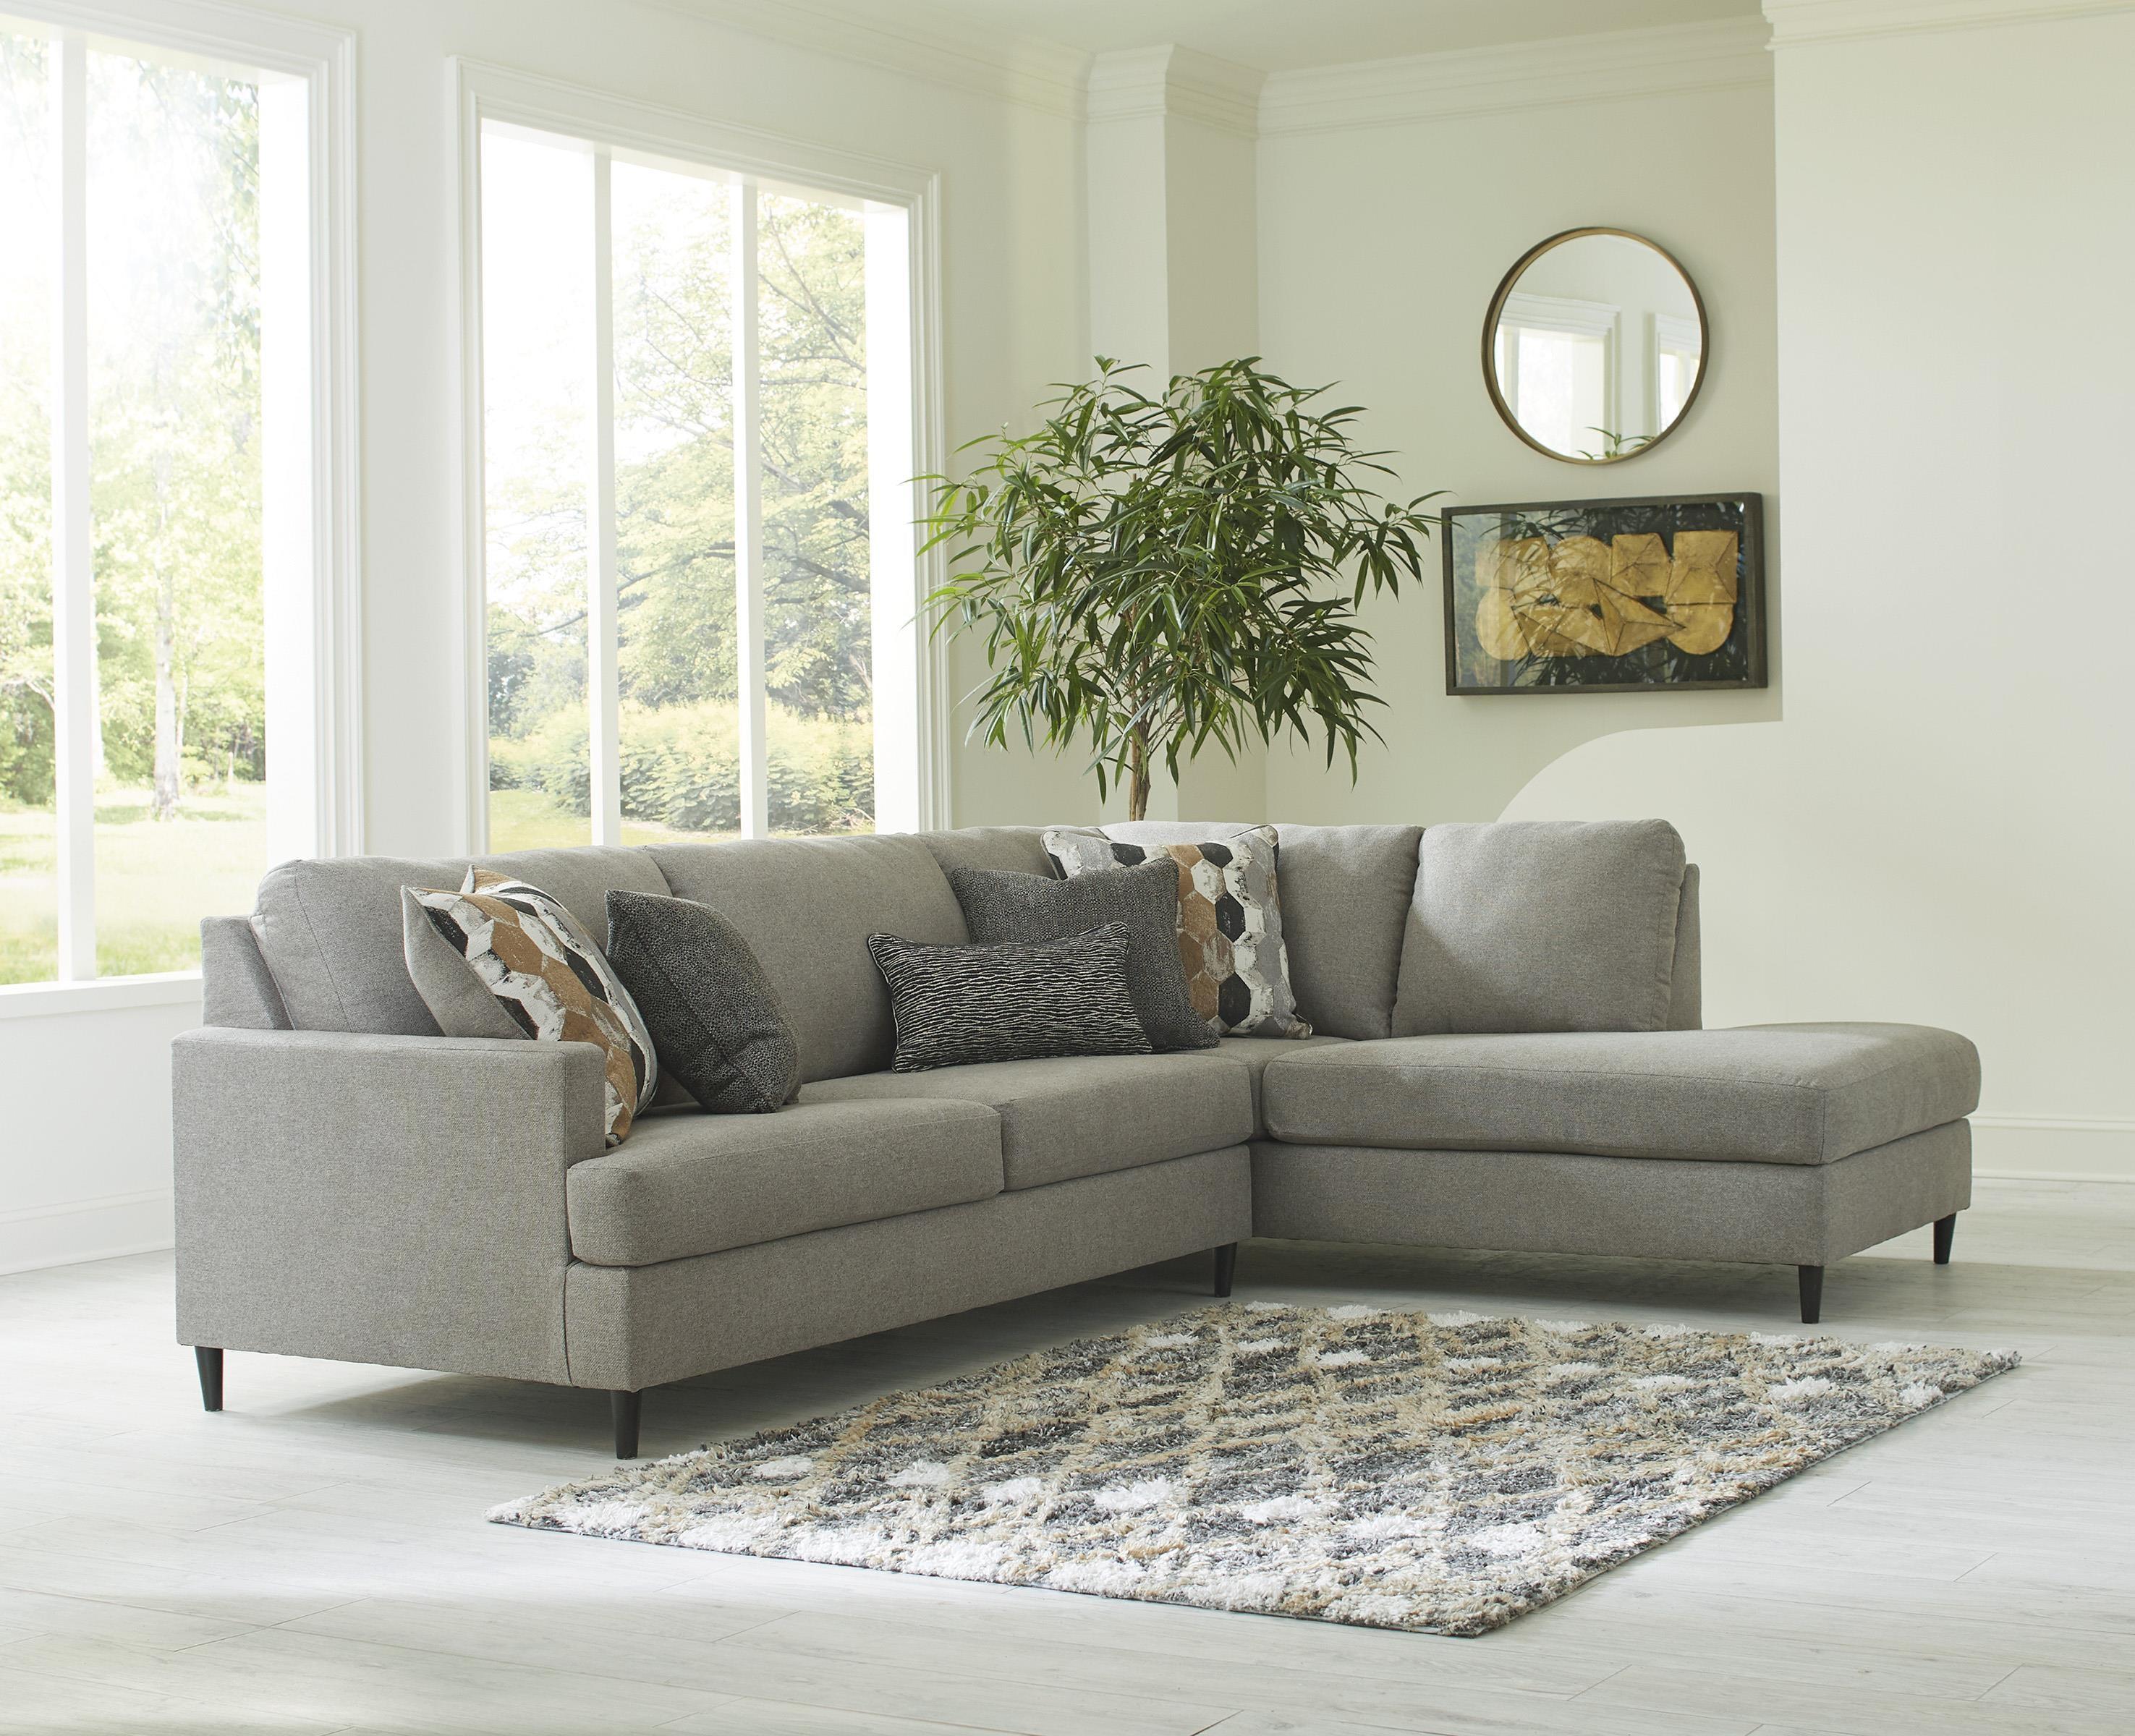 Santasia 2 Piece Sofa Chaise Sectional by Ashley Furniture at Sam Levitz Furniture